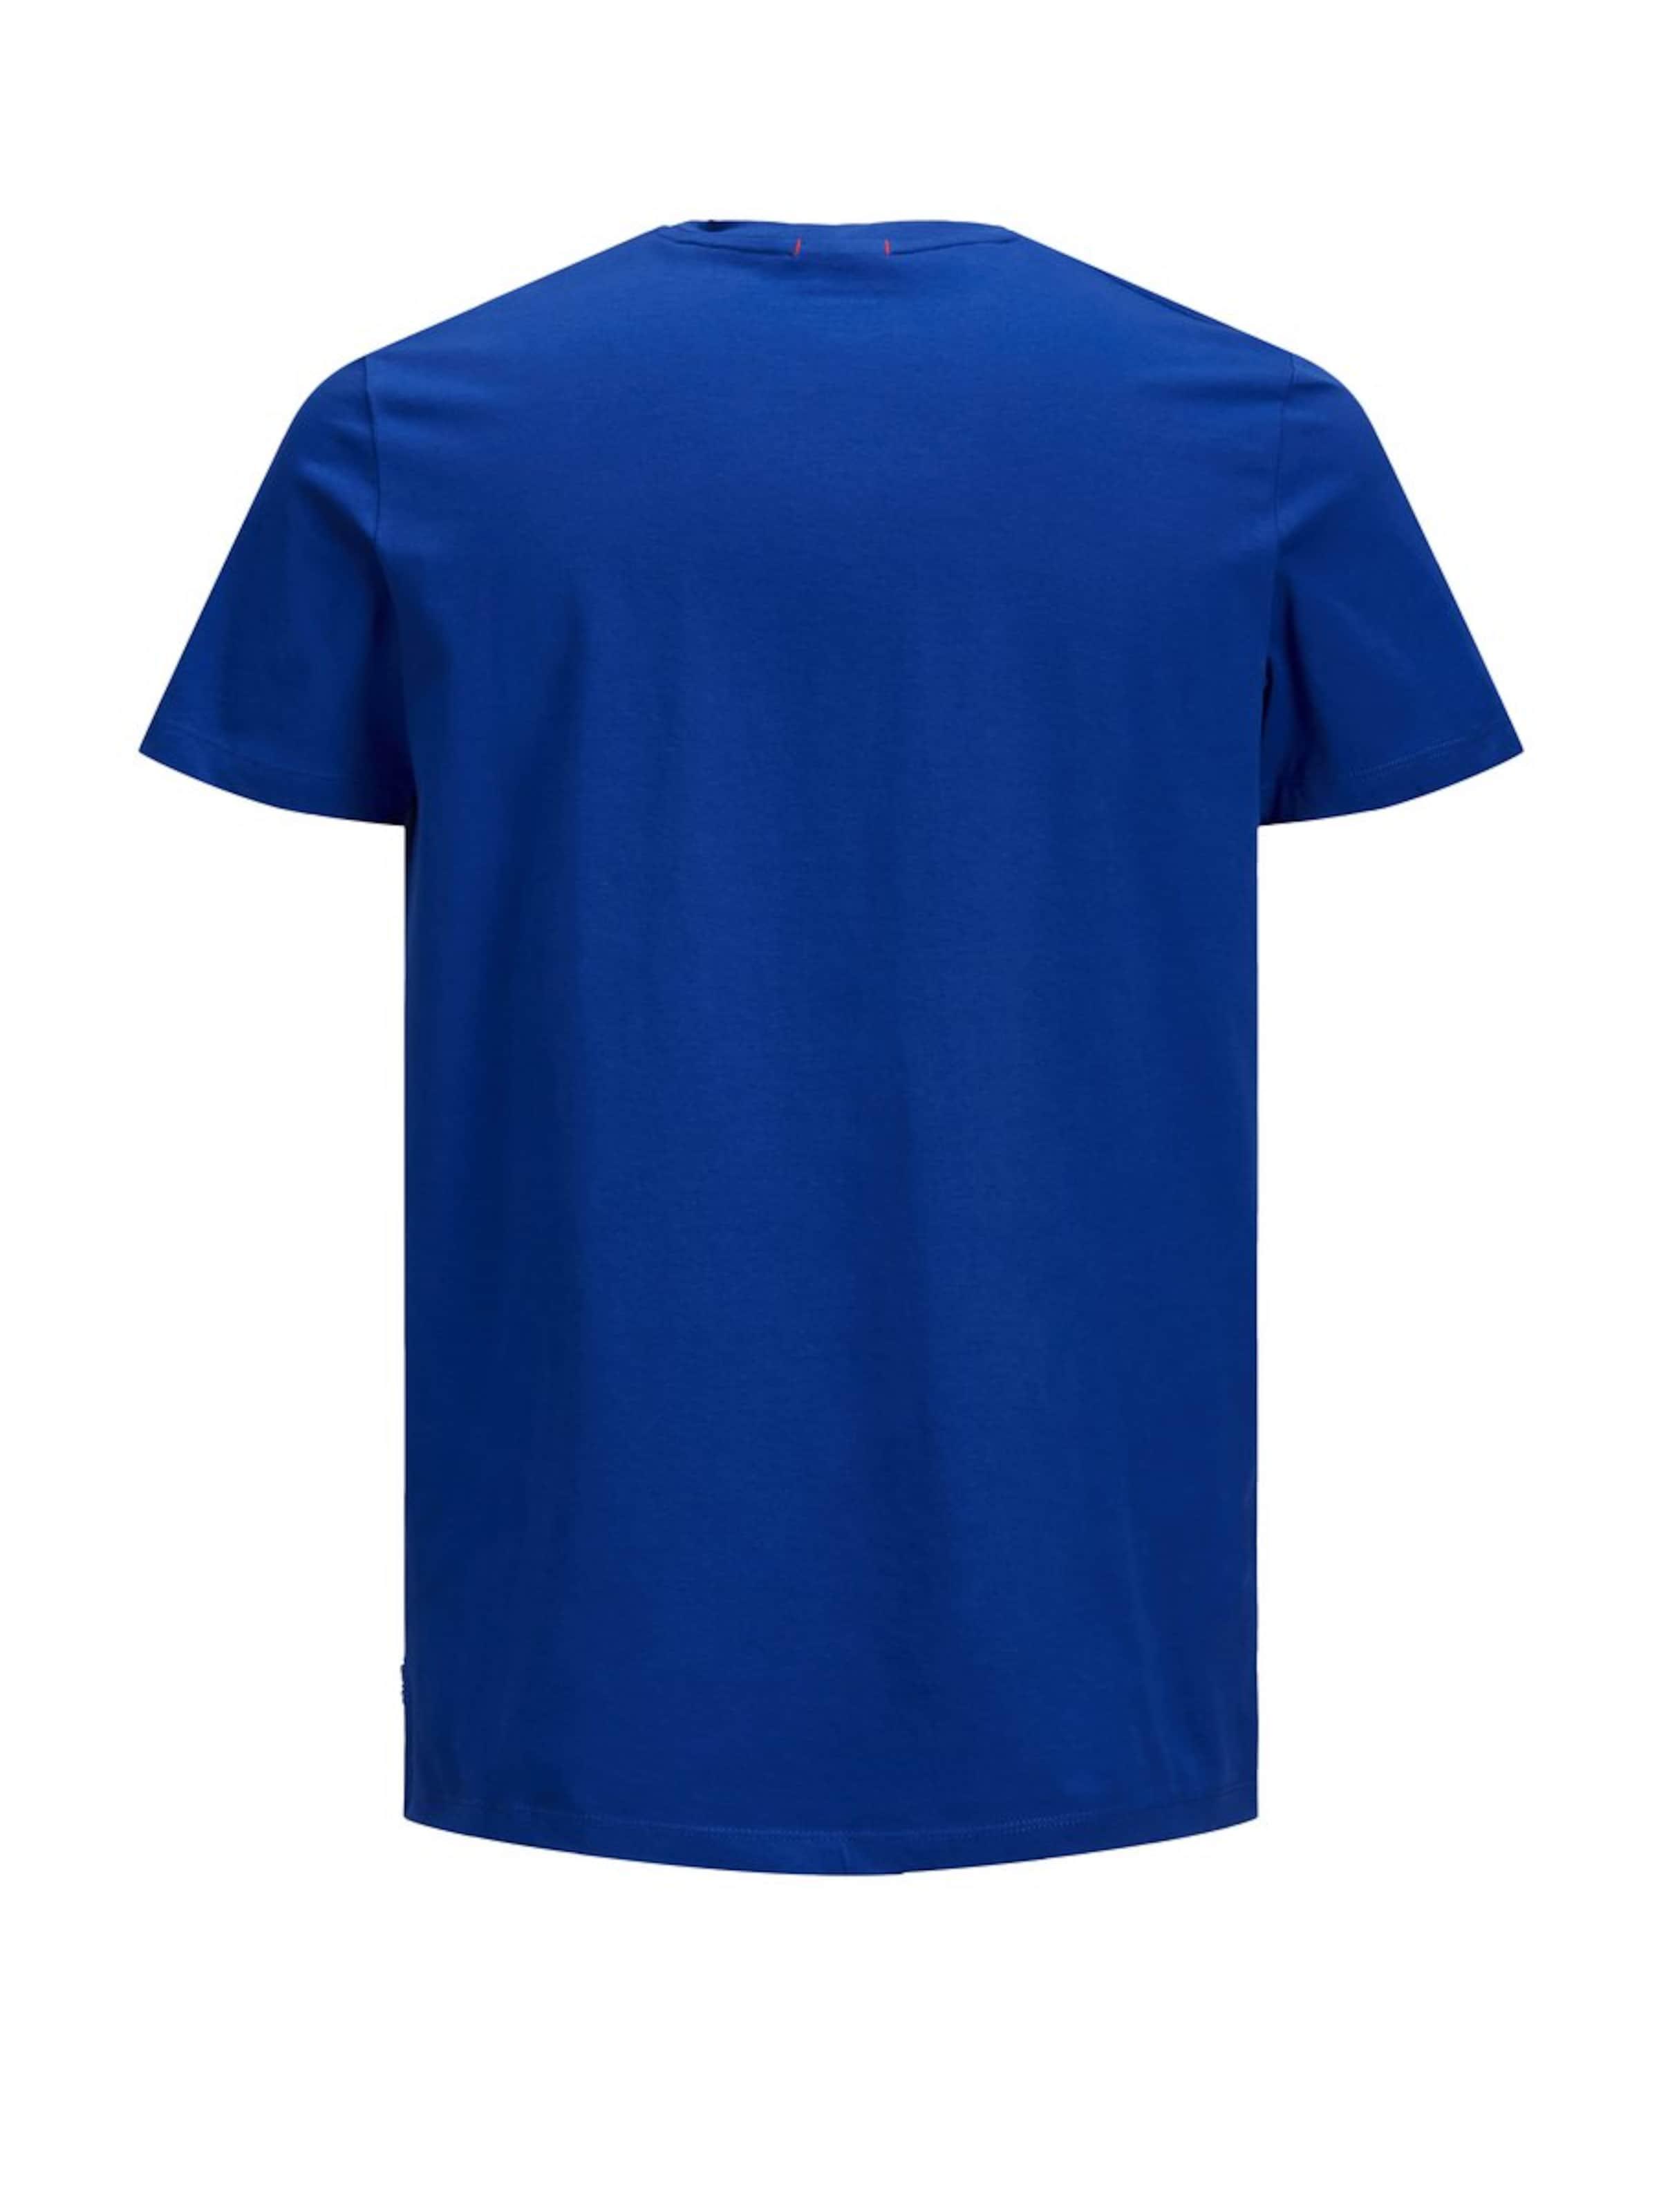 Jones BlauAqua Hellrot In shirt Weiß Jackamp; T YvmIb6fg7y